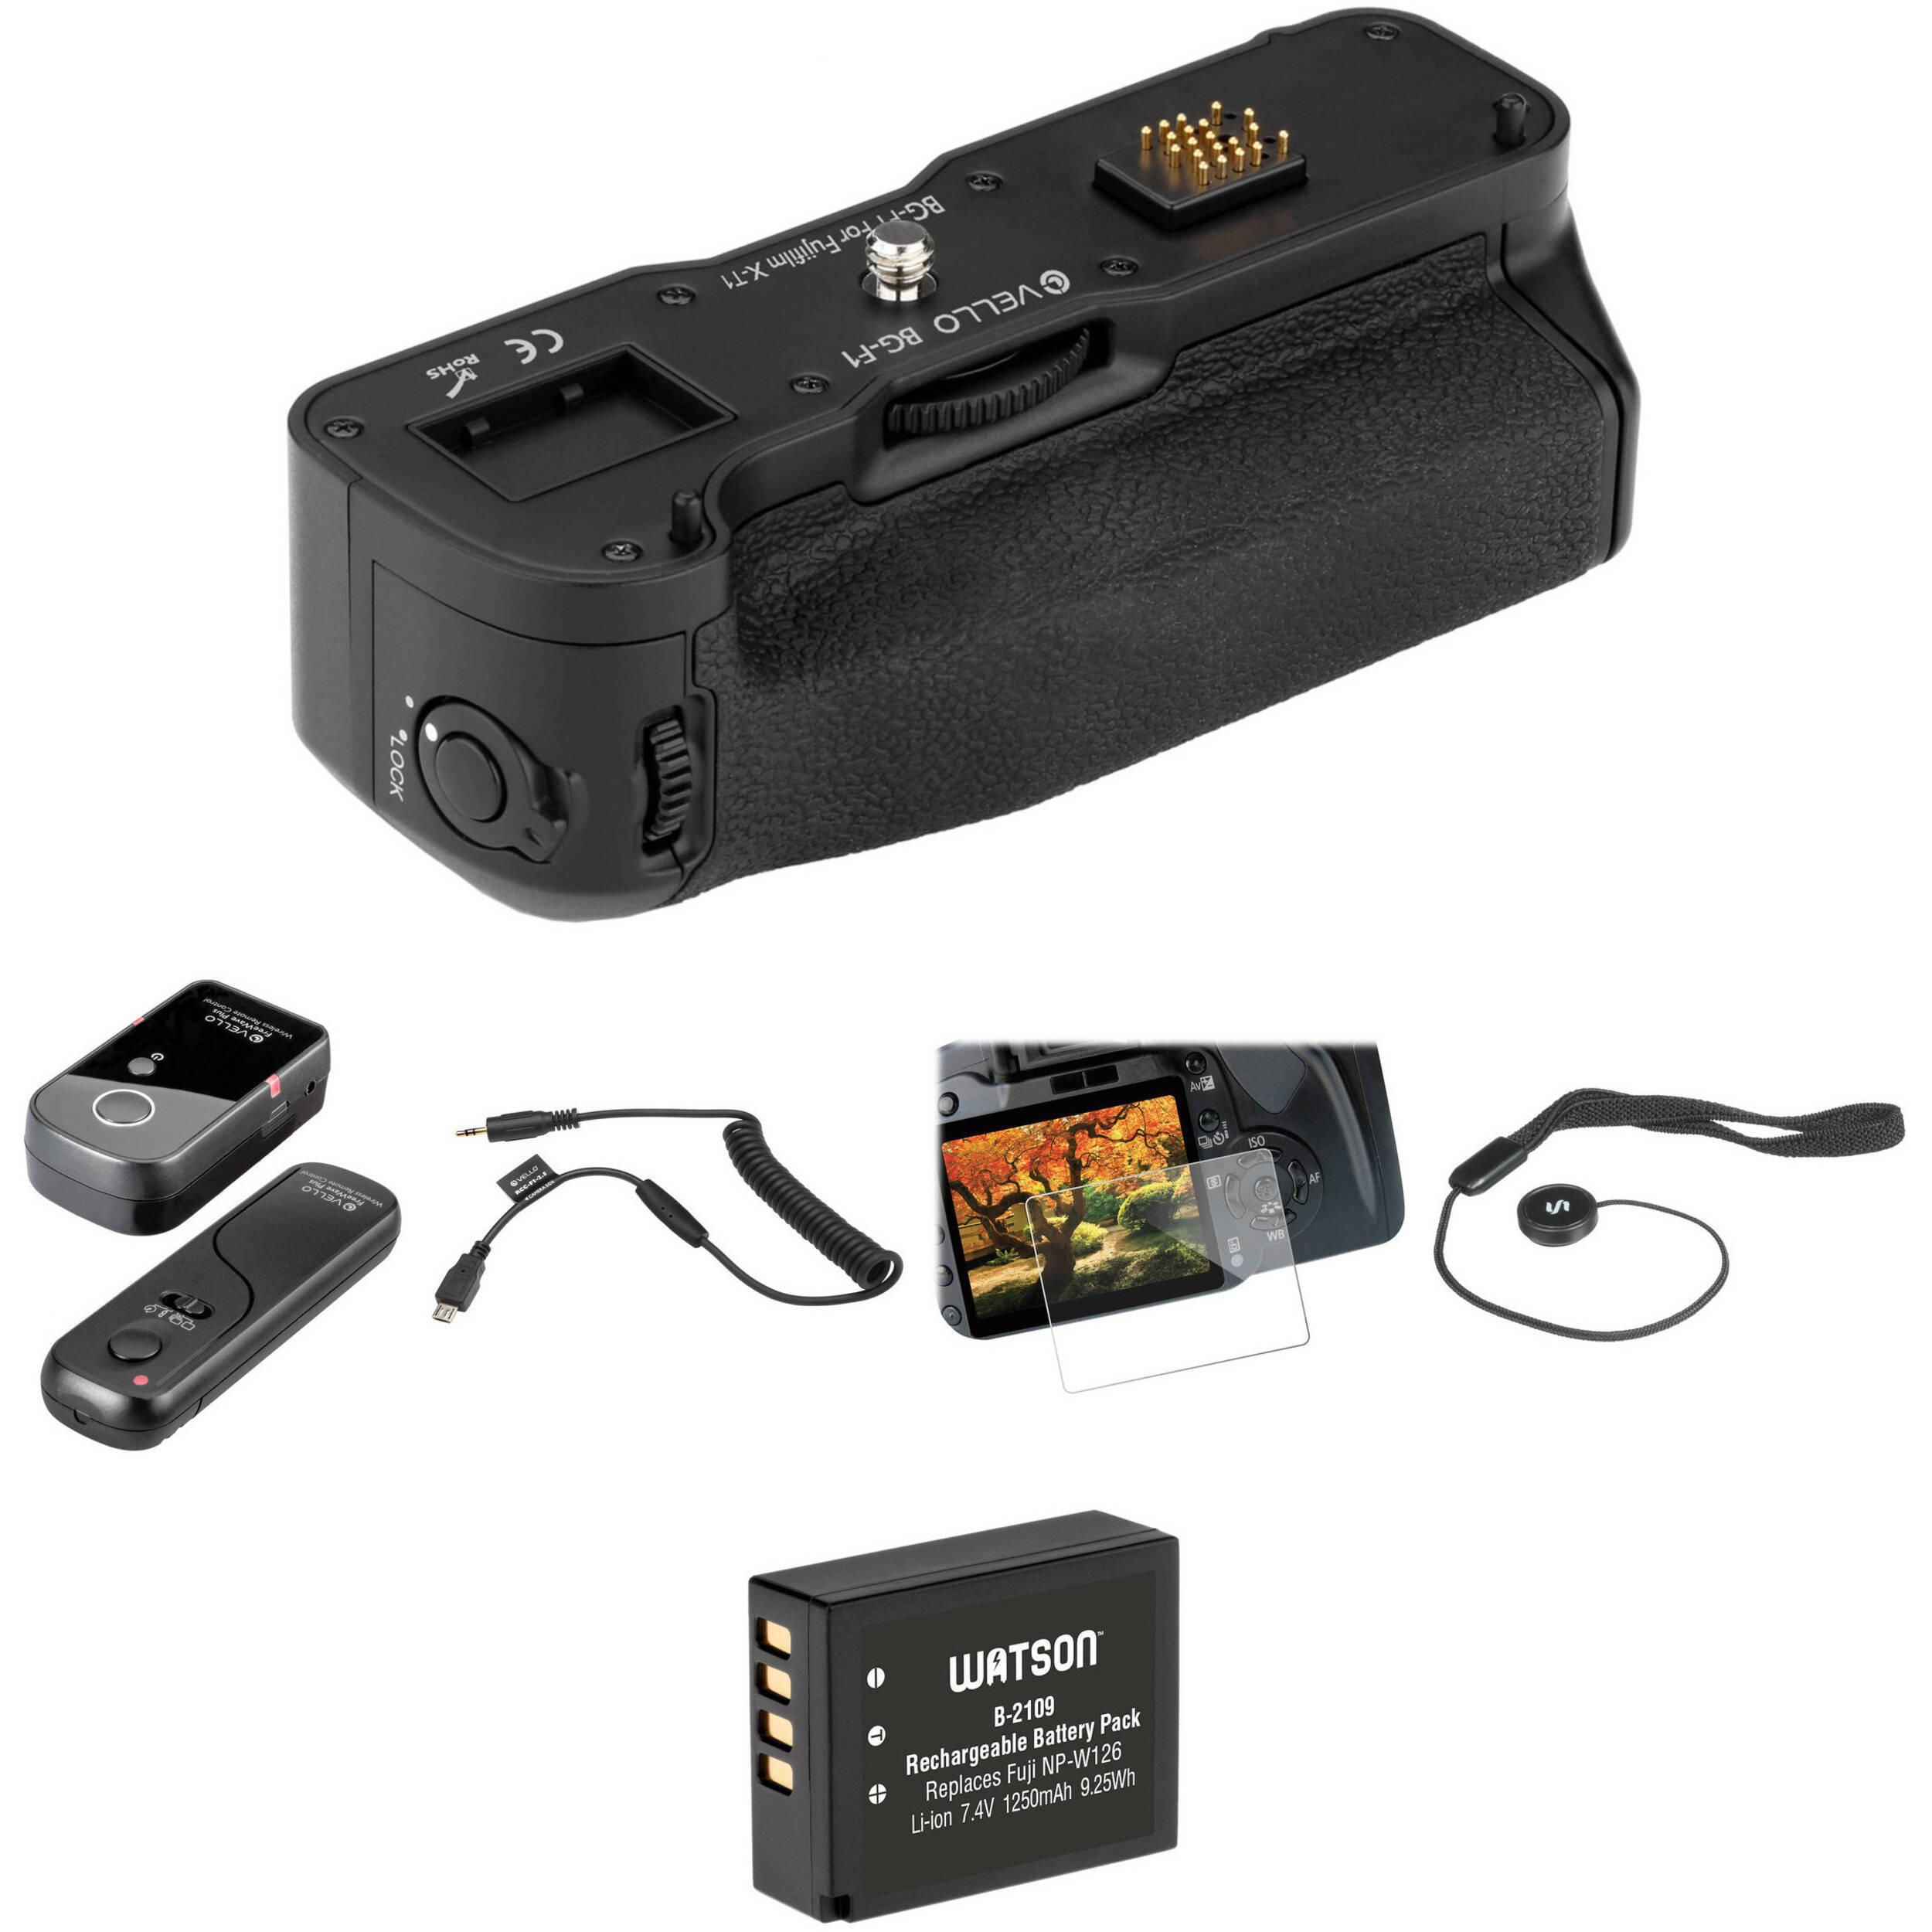 Electronics Power Packs T1i XTi XS & G10 Digital SLR Cameras XSi ...